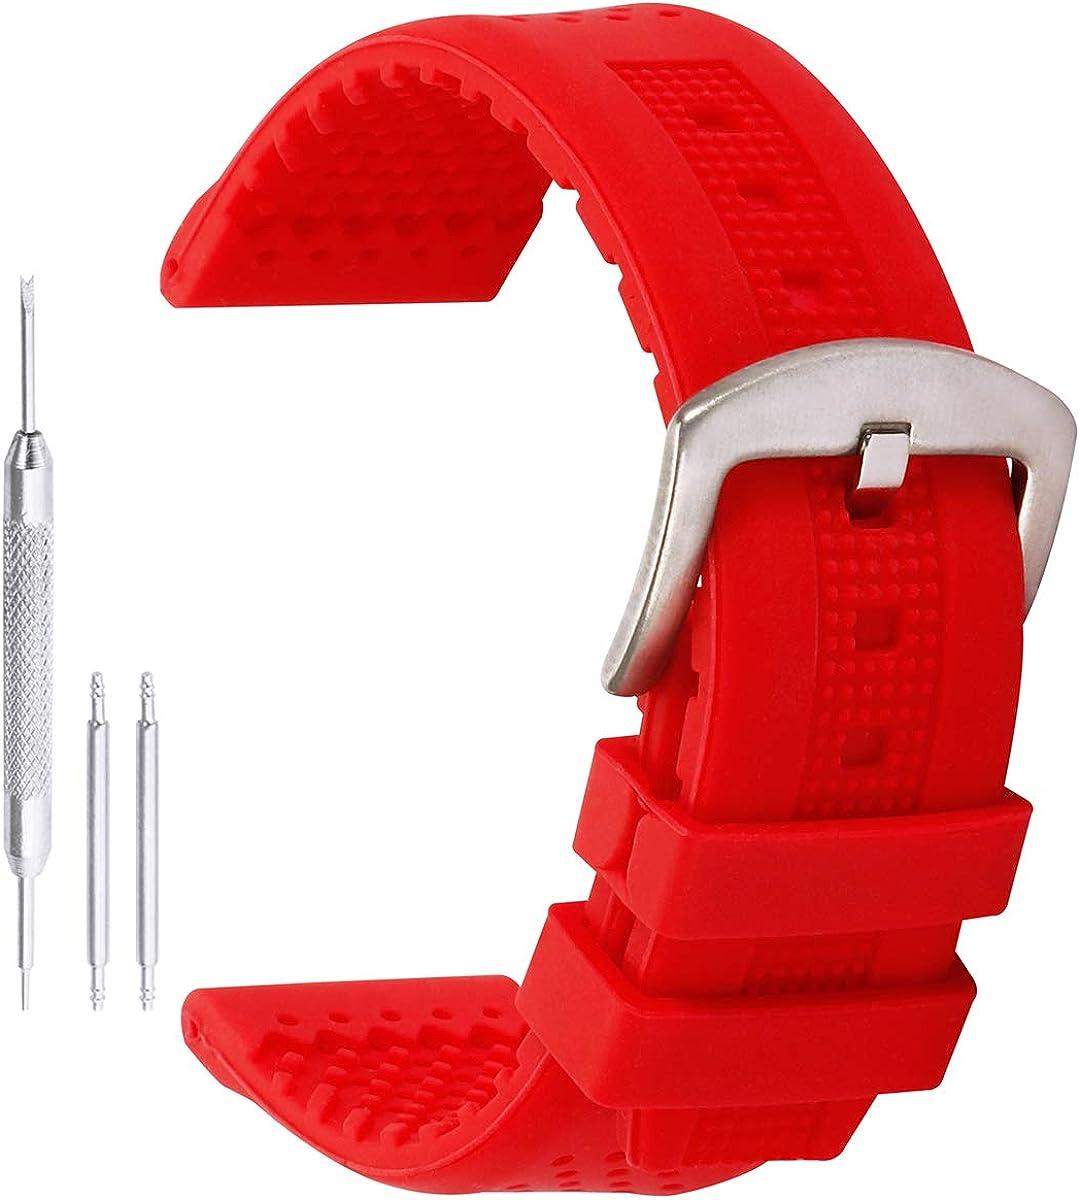 Deportes de la Moda Relojes Bandas de Silicona de reemplazo de Caucho Reloj Pulsera Perforada